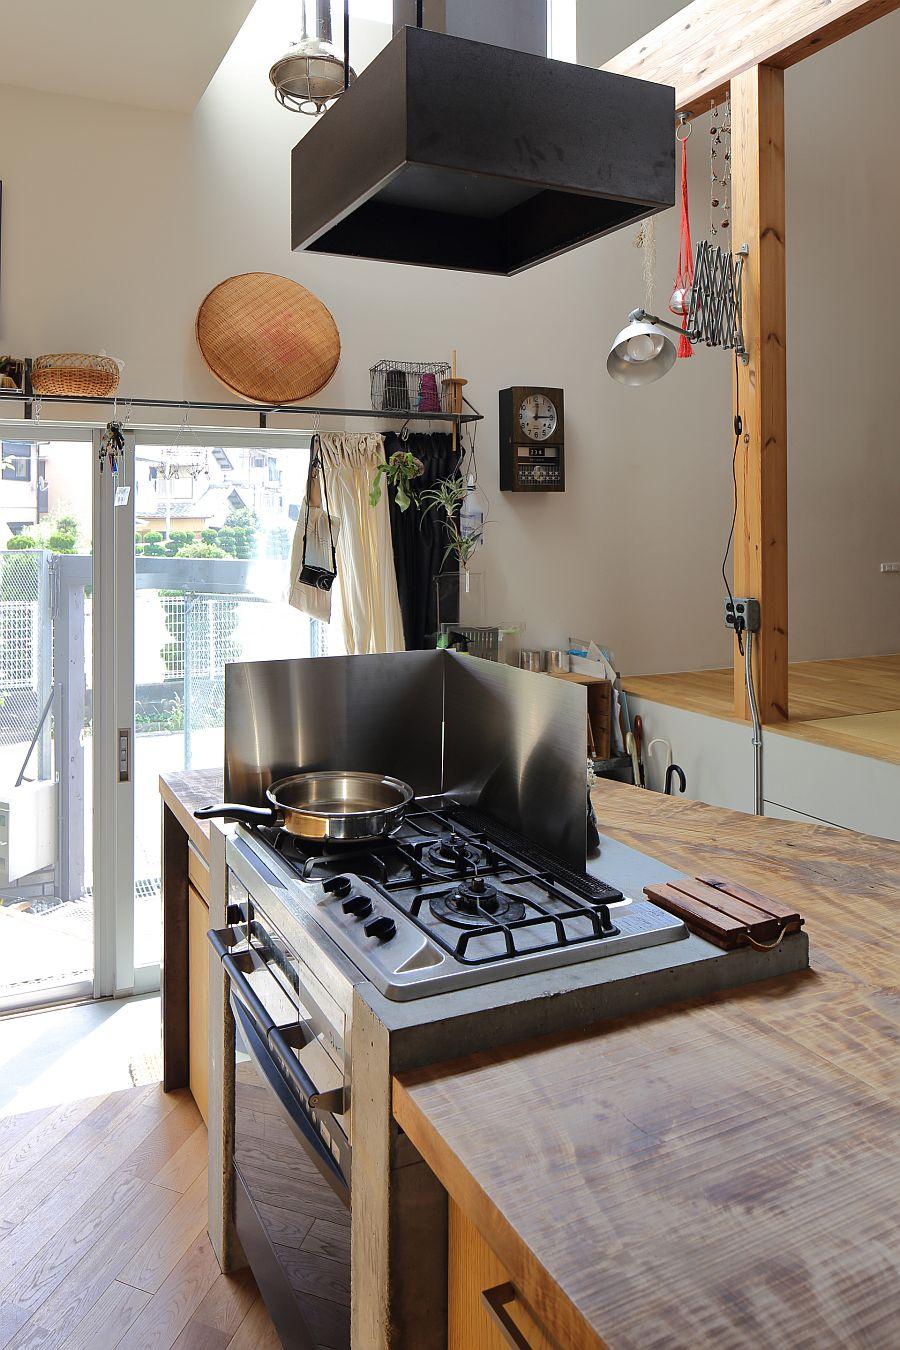 Custom kitchen island with range